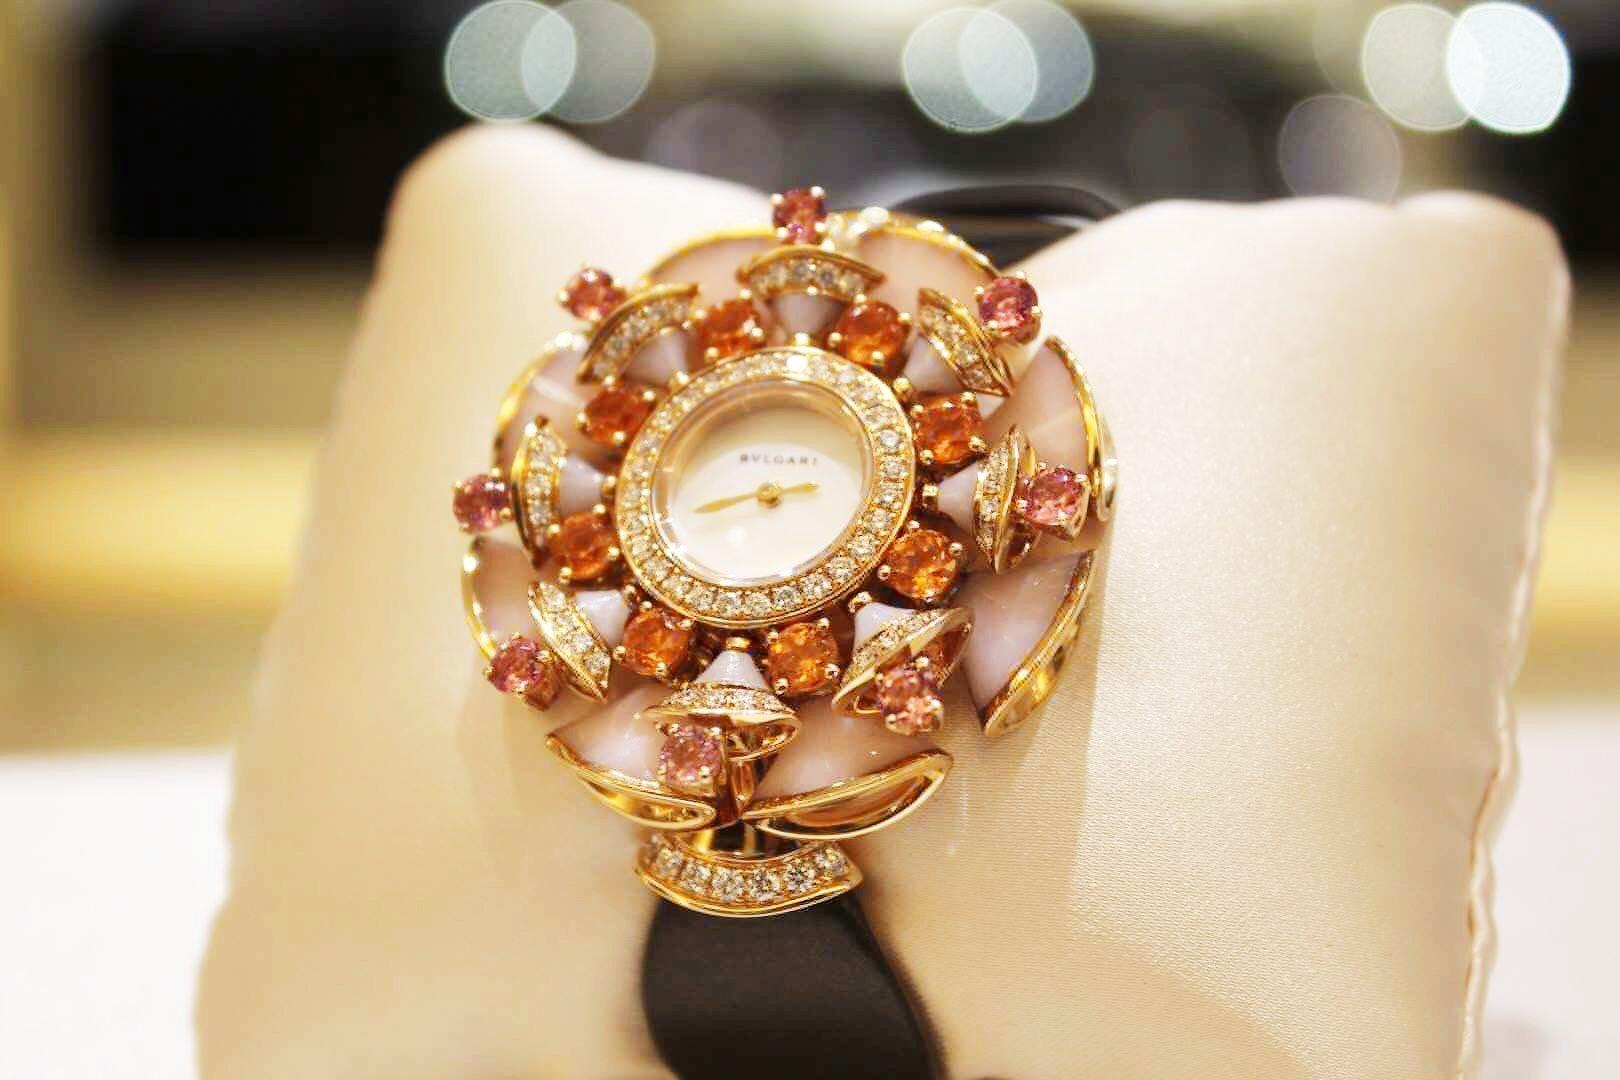 BVLGARI宝格丽女表DIVAS'DREAM 珠宝腕表系列 39mm 102420插图